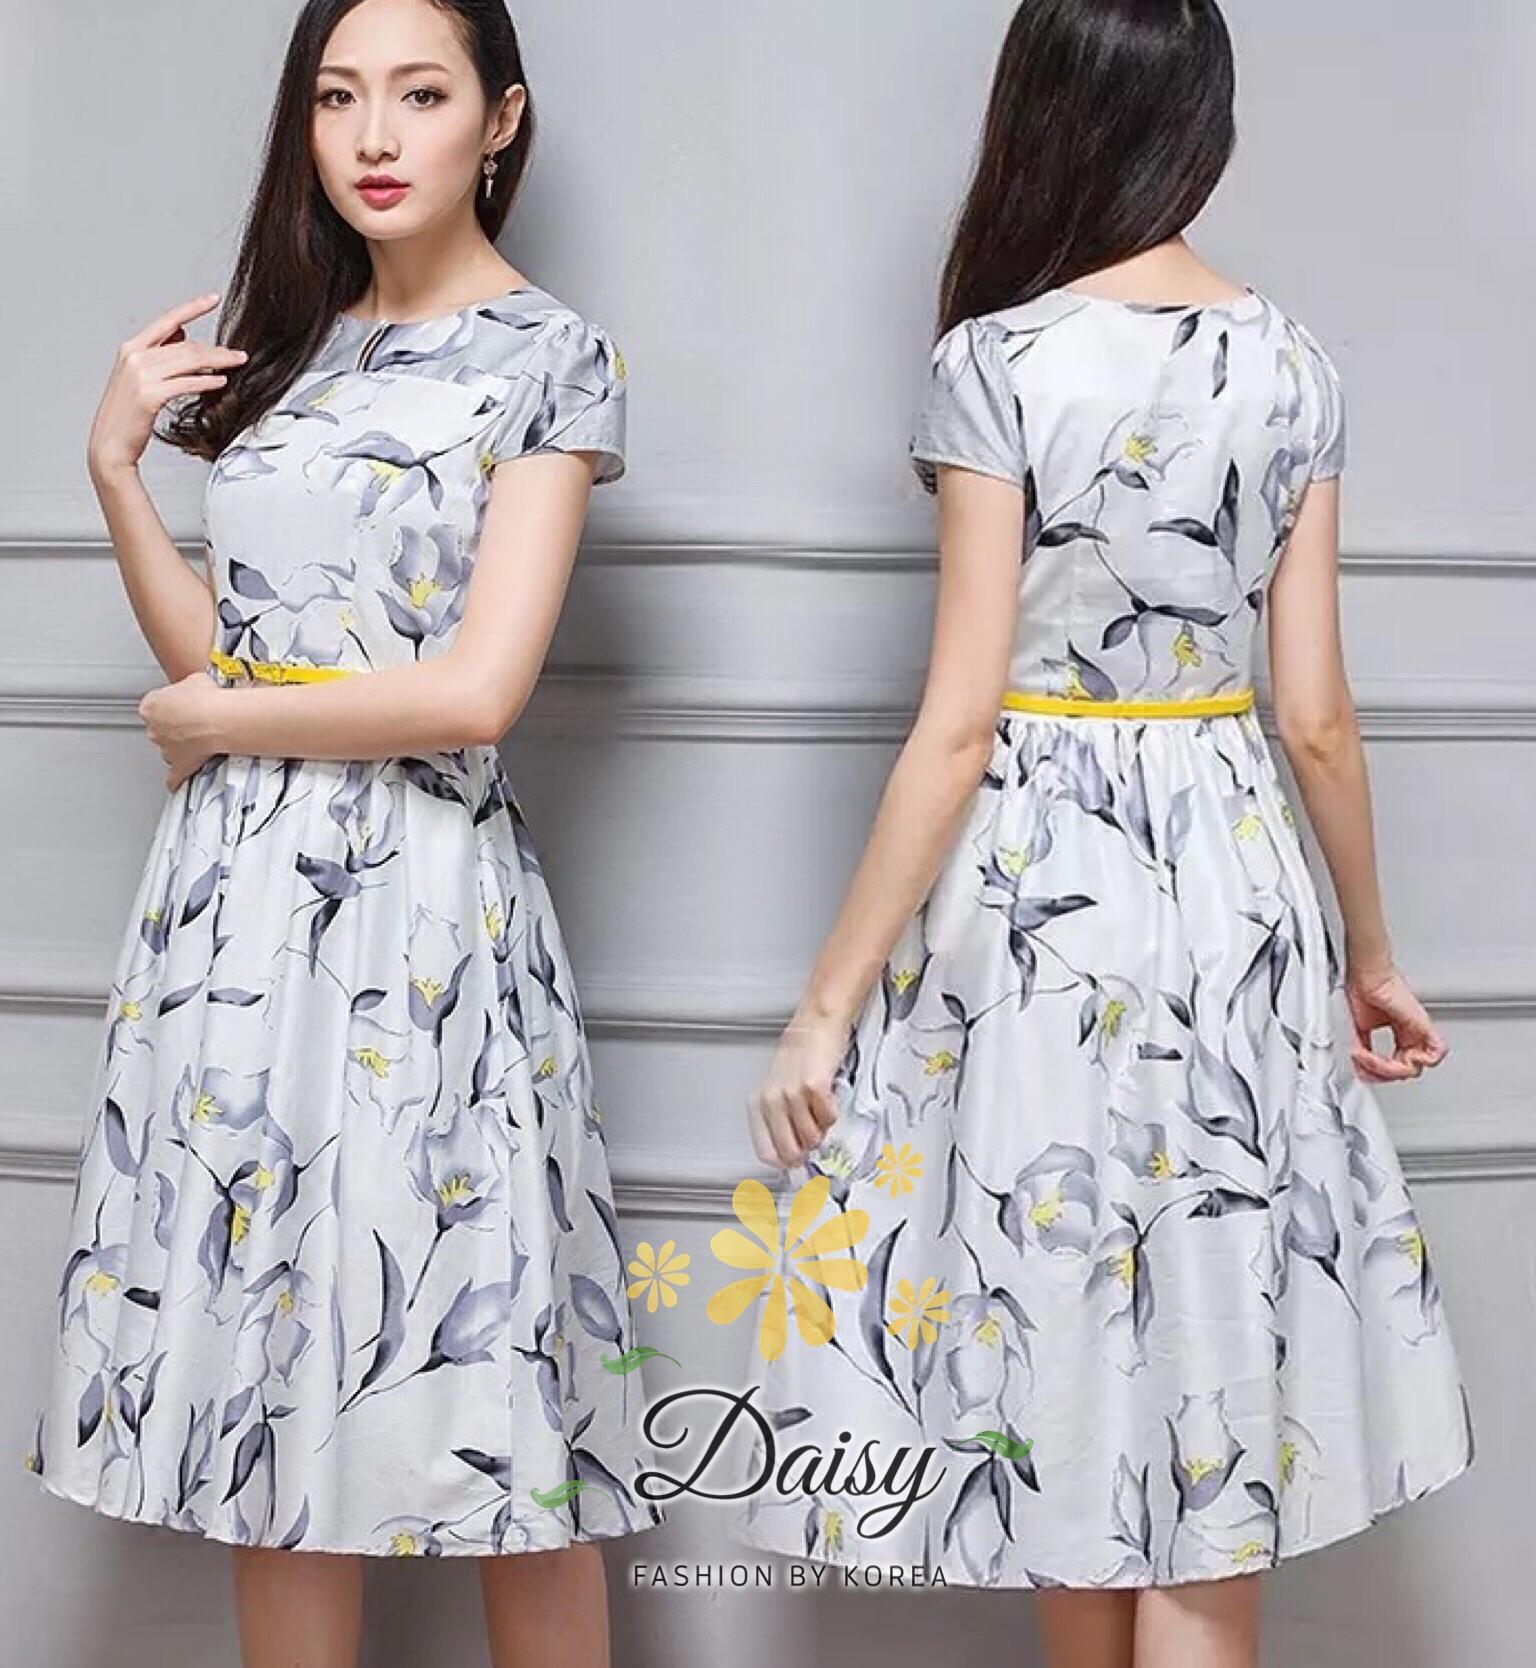 Daisy grey flower white satin dress with belt